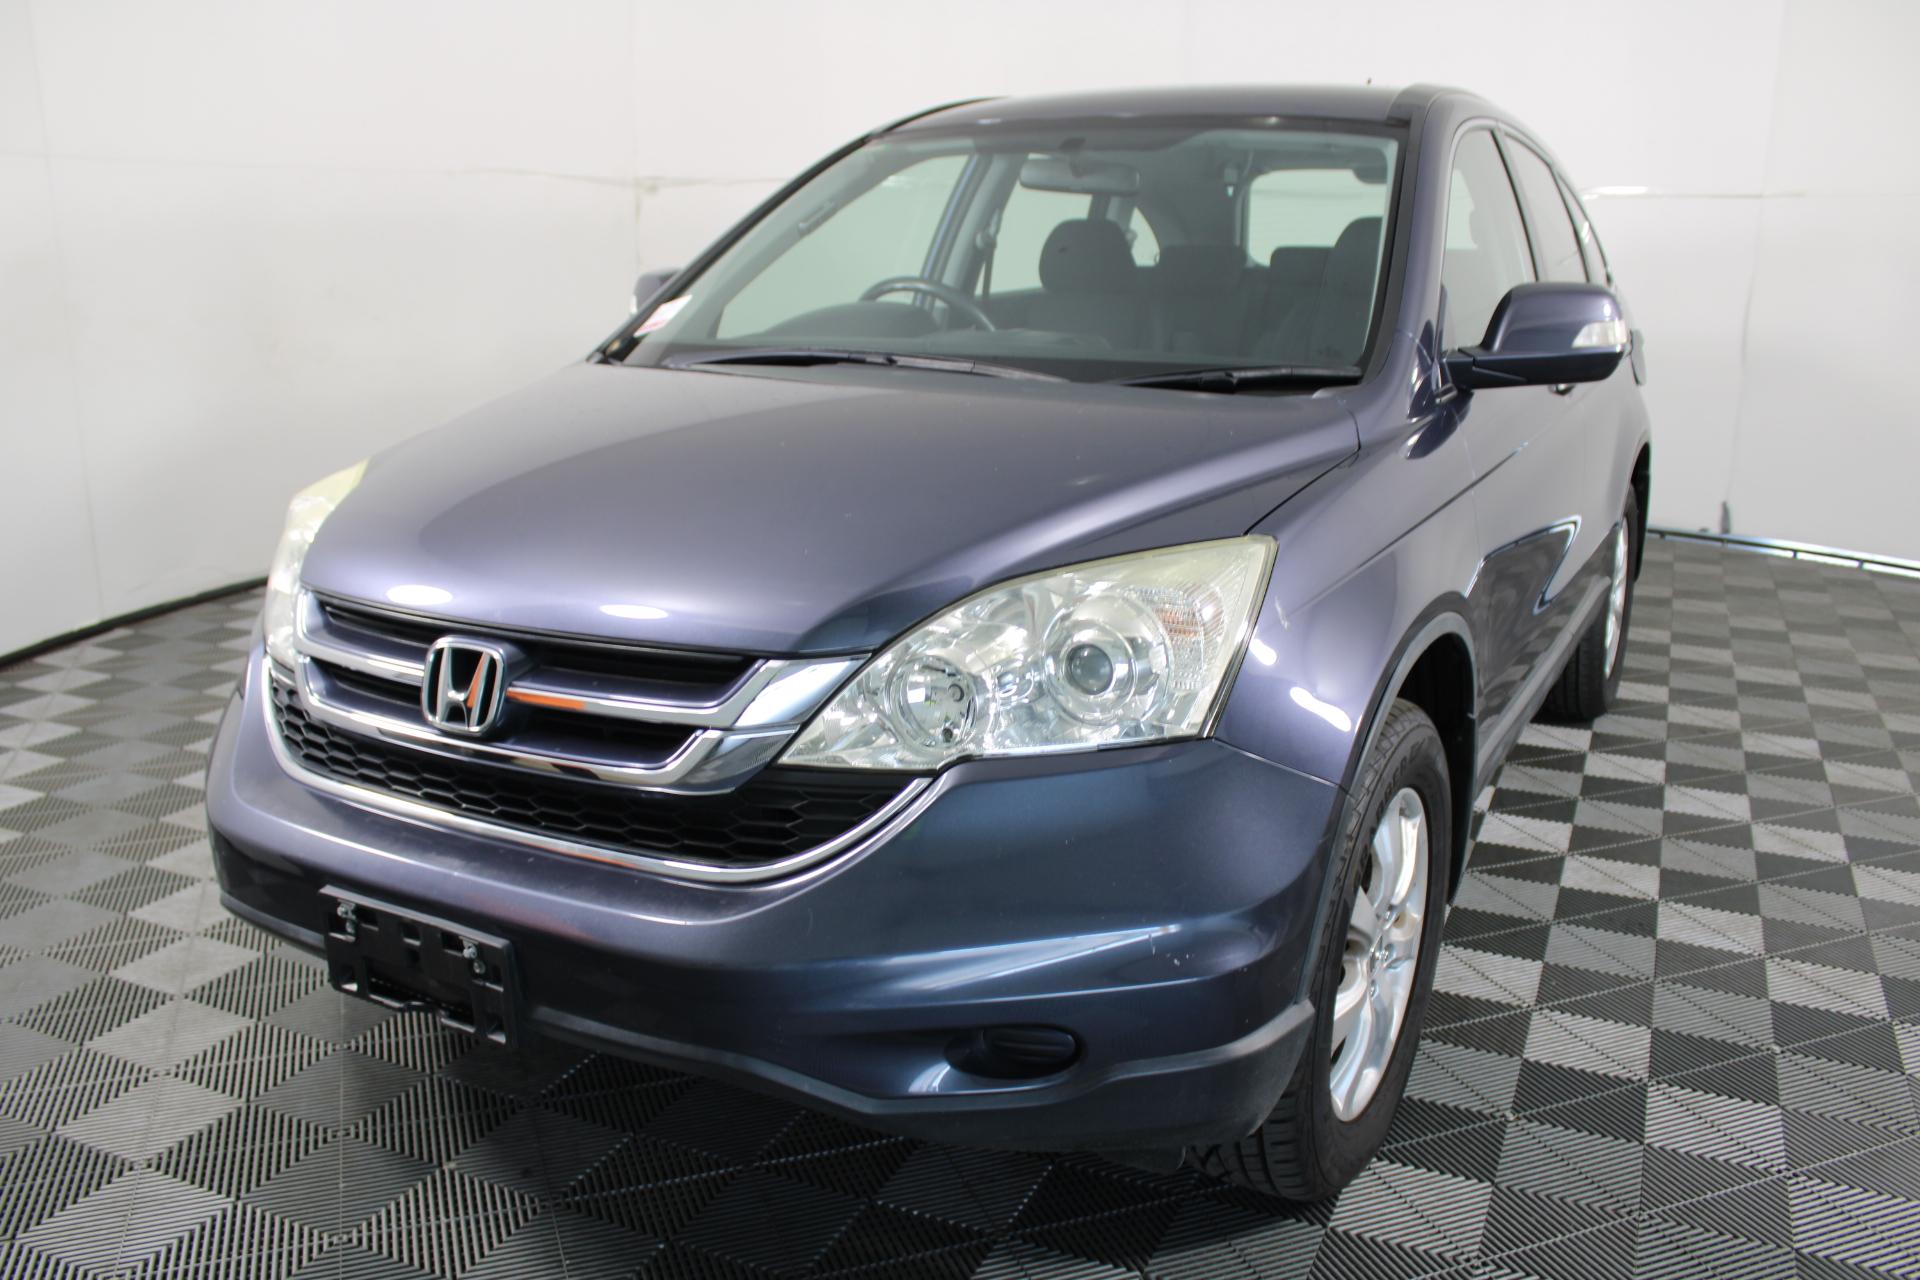 2010 Honda CR-V LIMITED EDITION RE Wagon 134,303km